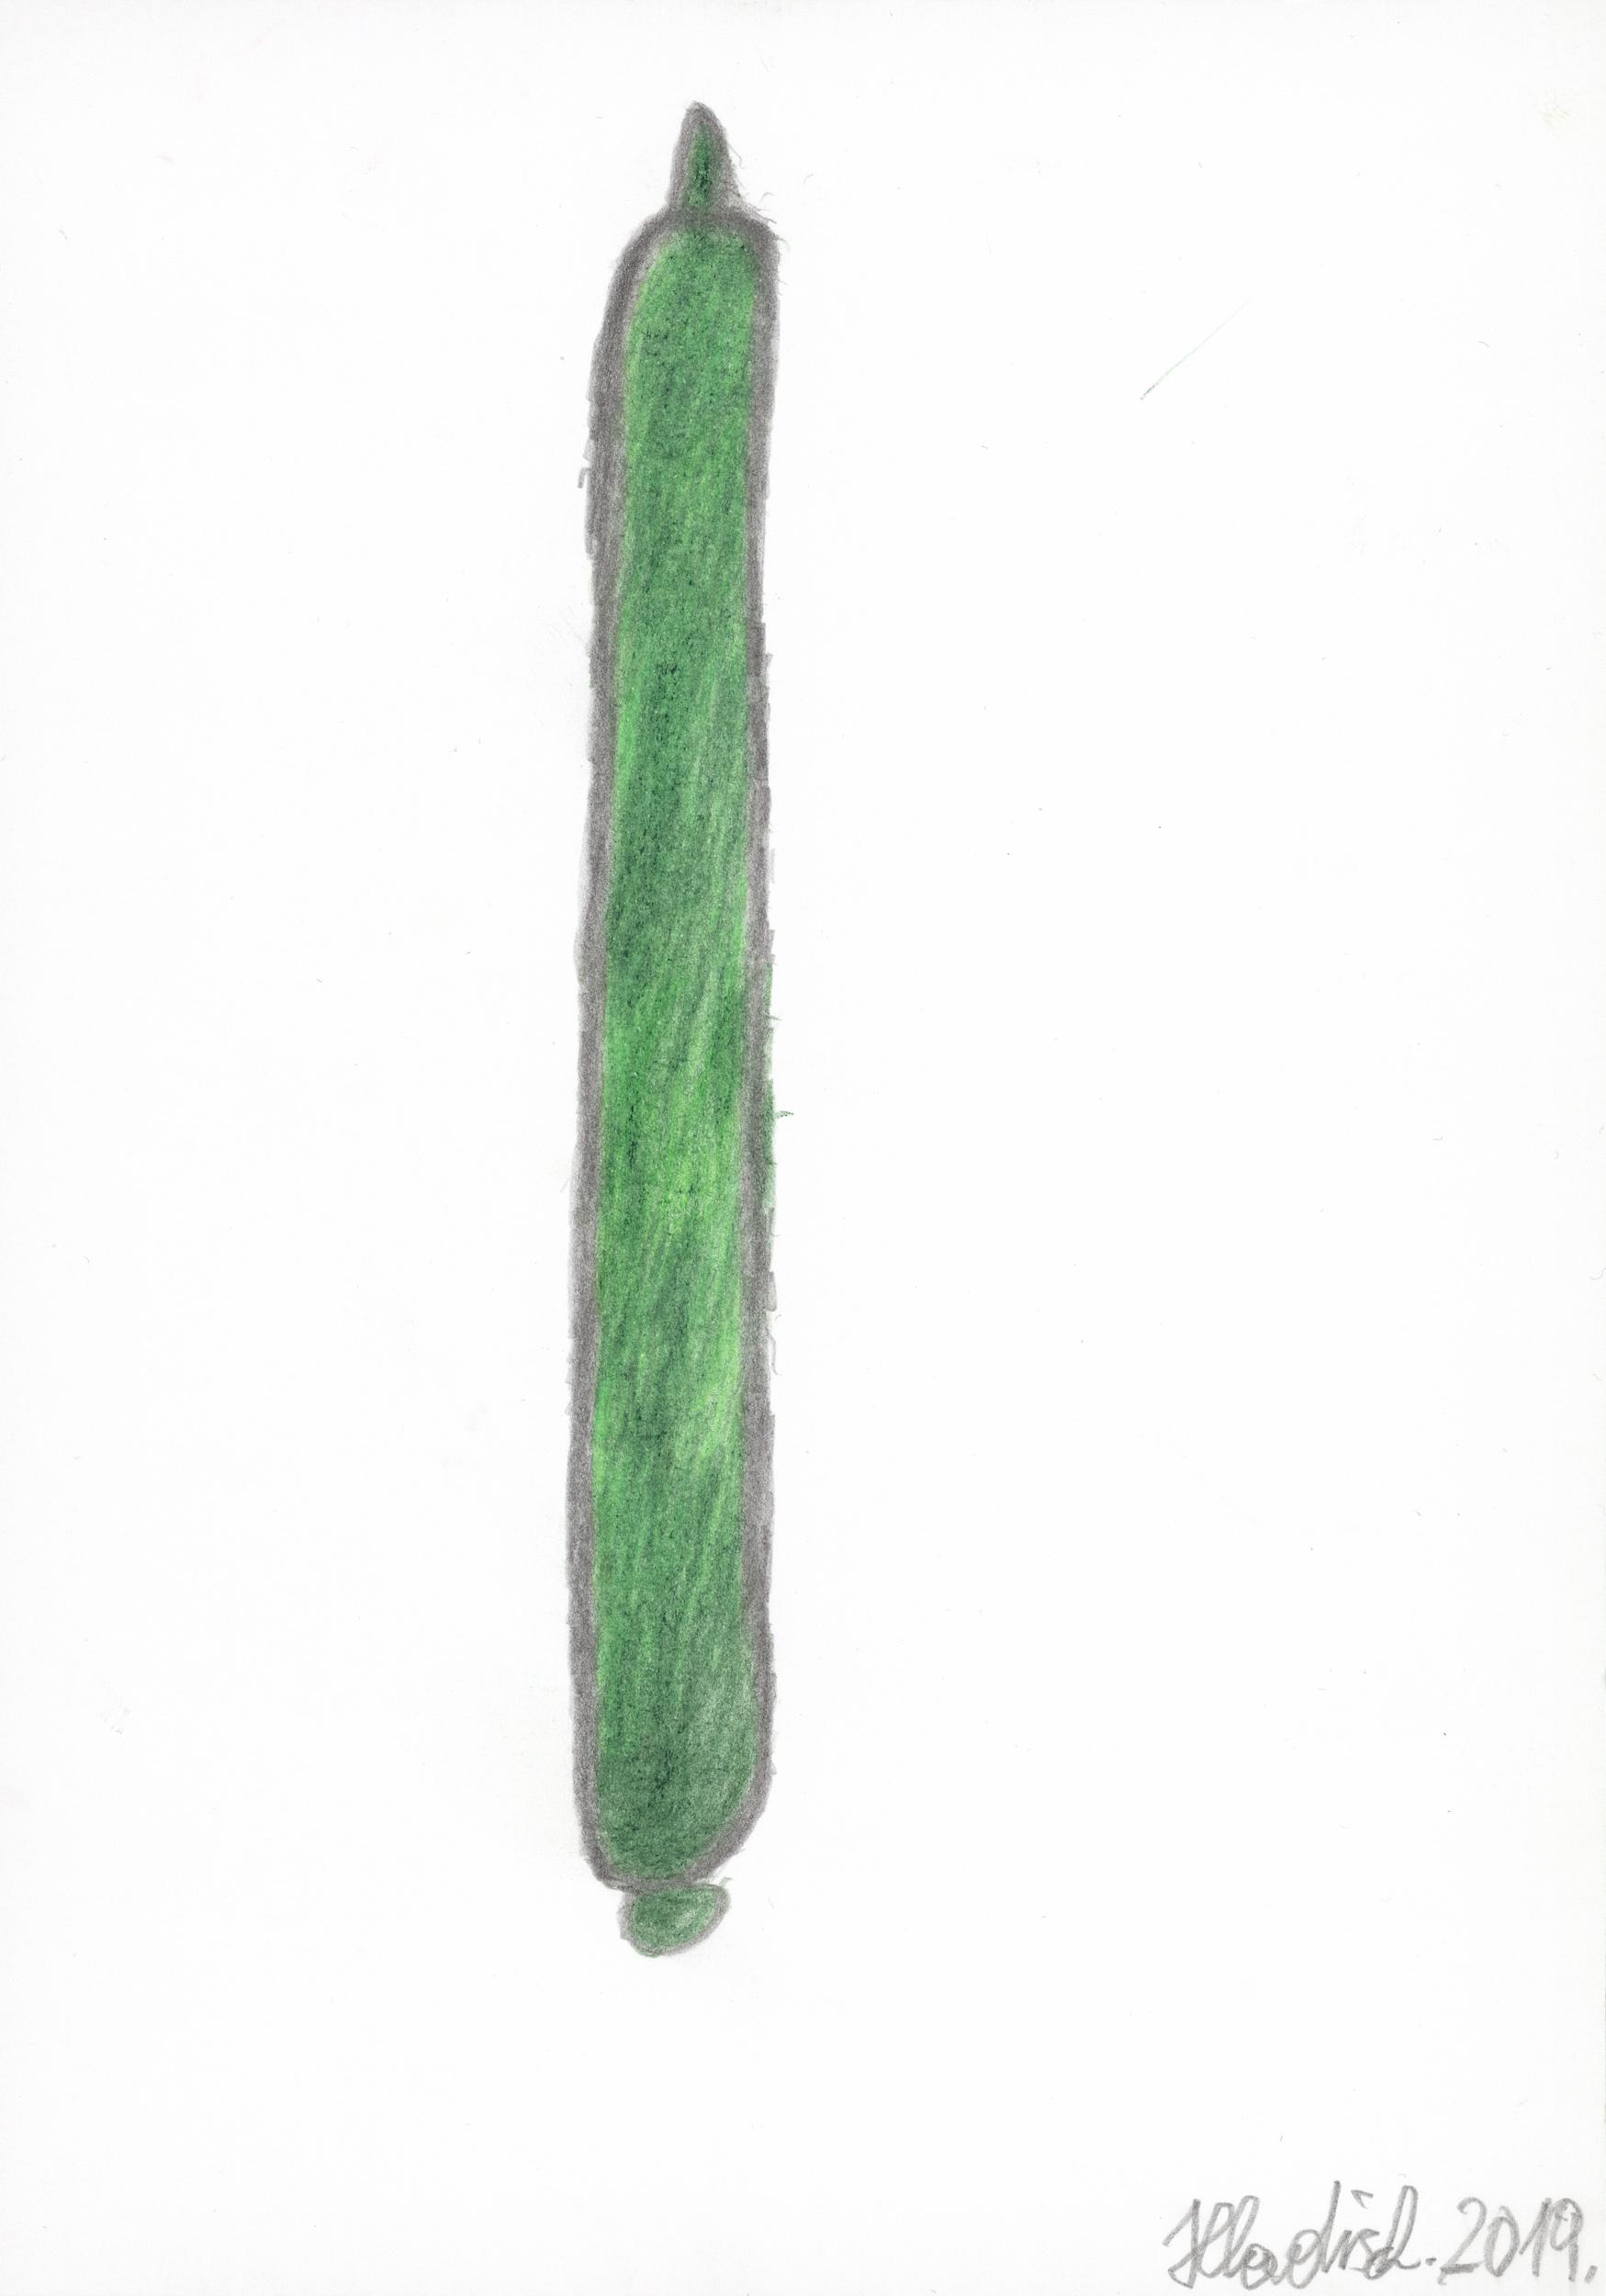 hladisch helmut - Gurke / Cucumber